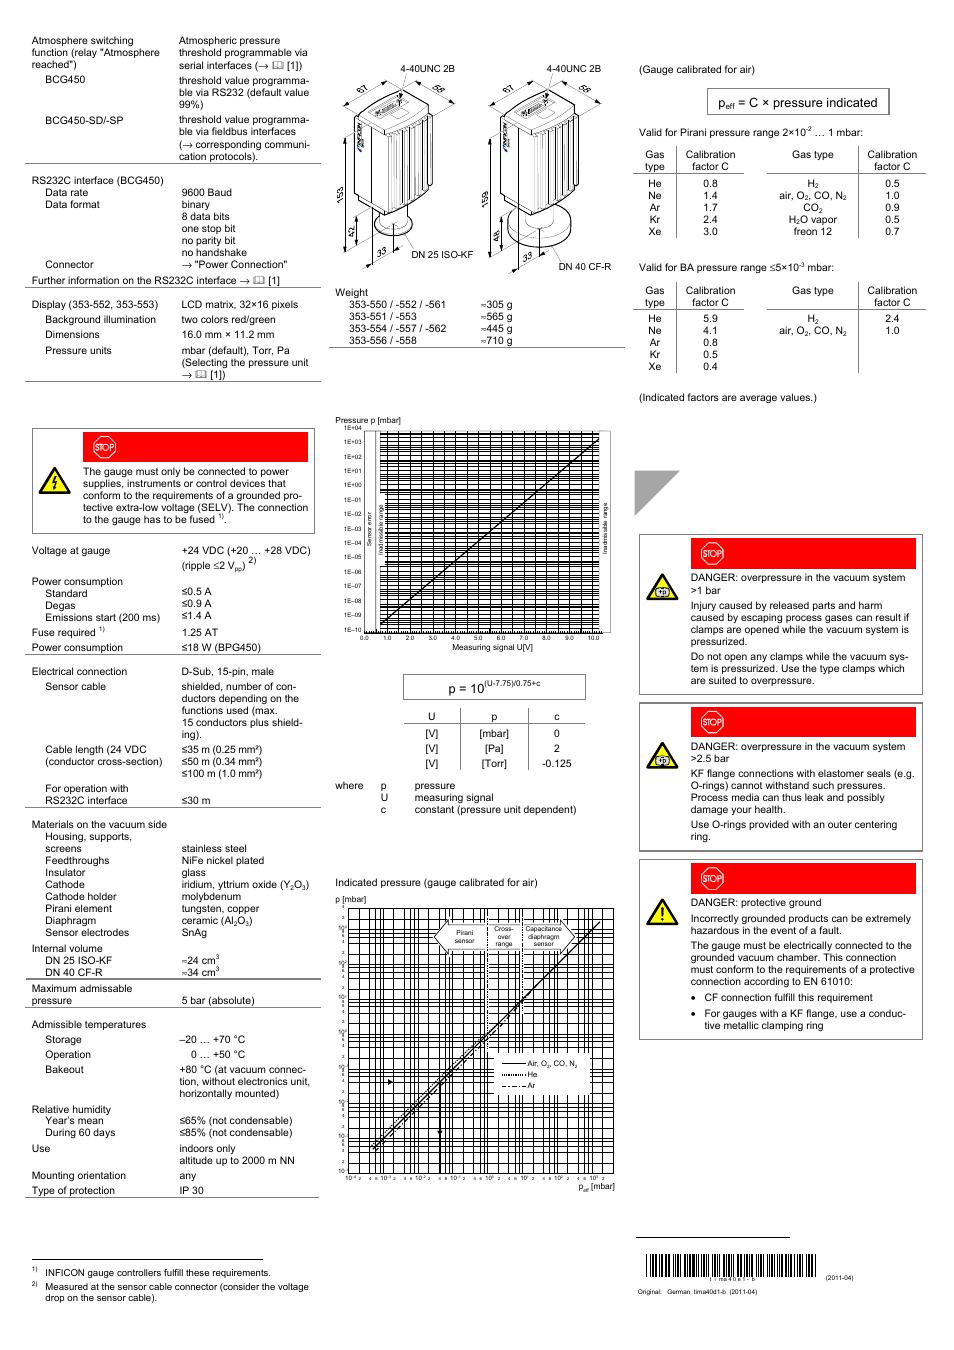 Installation, Measuring signal vs. pressure, Gas type